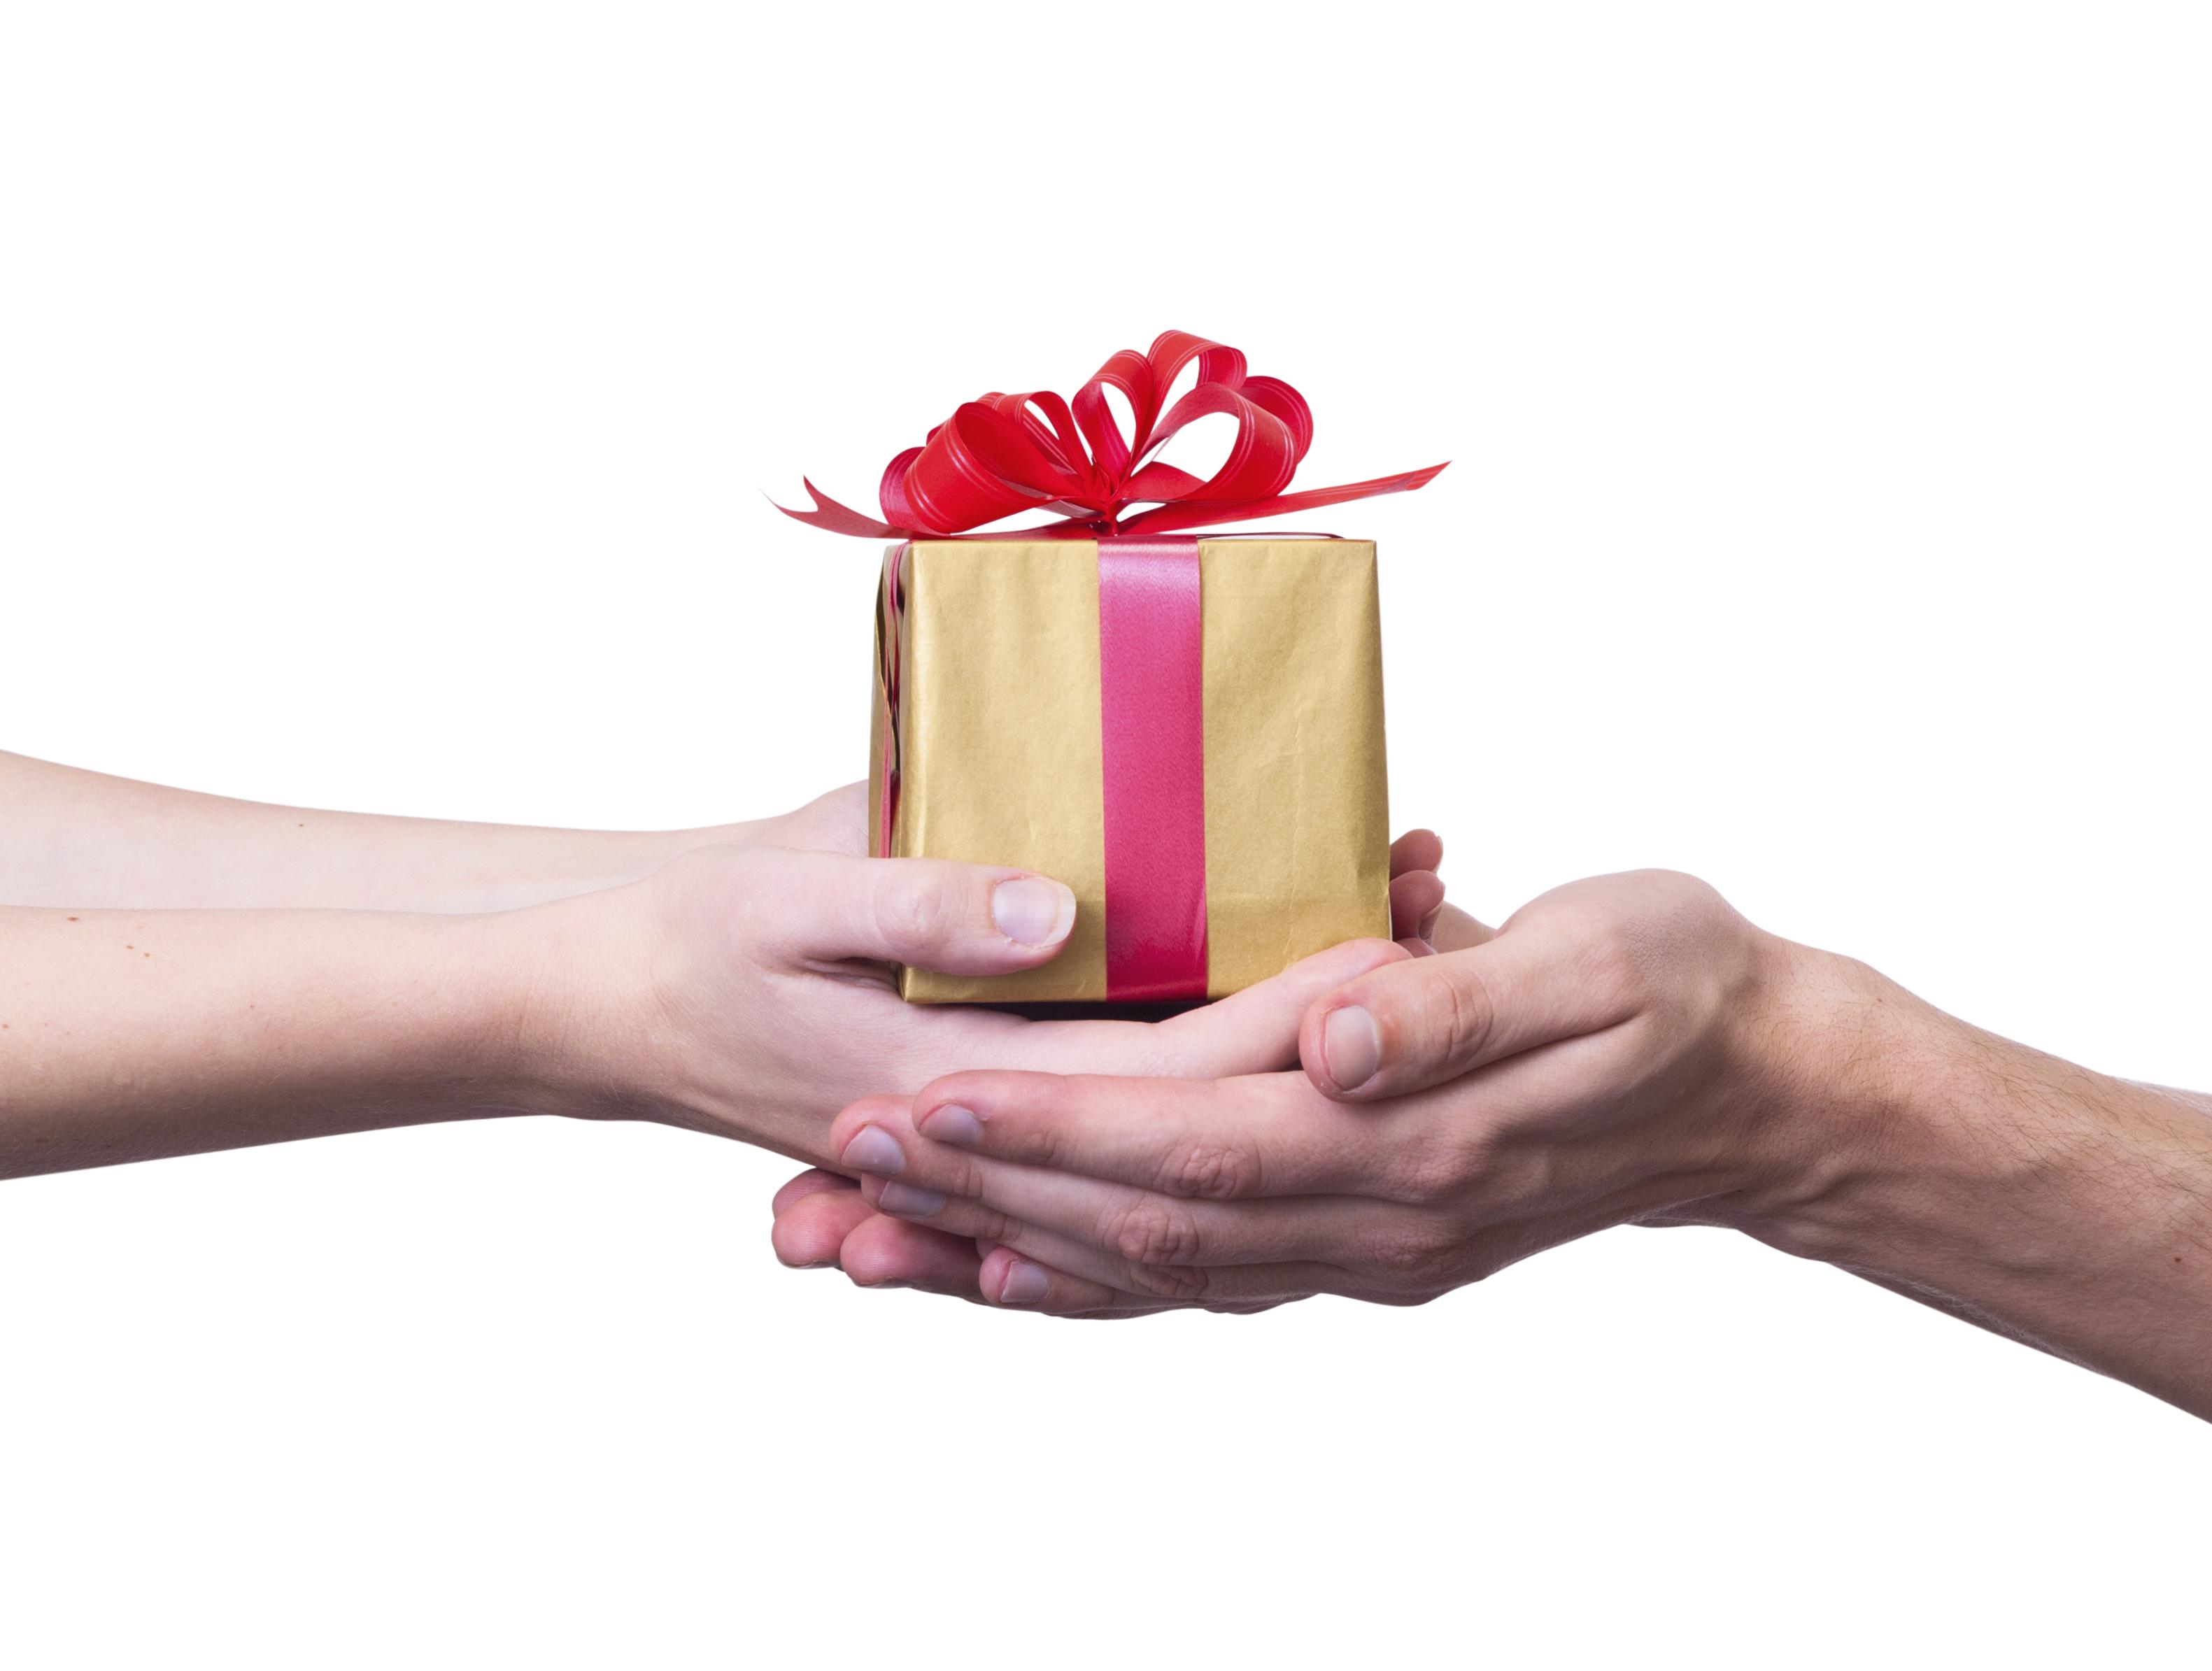 Pildiotsingu give and receive tulemus